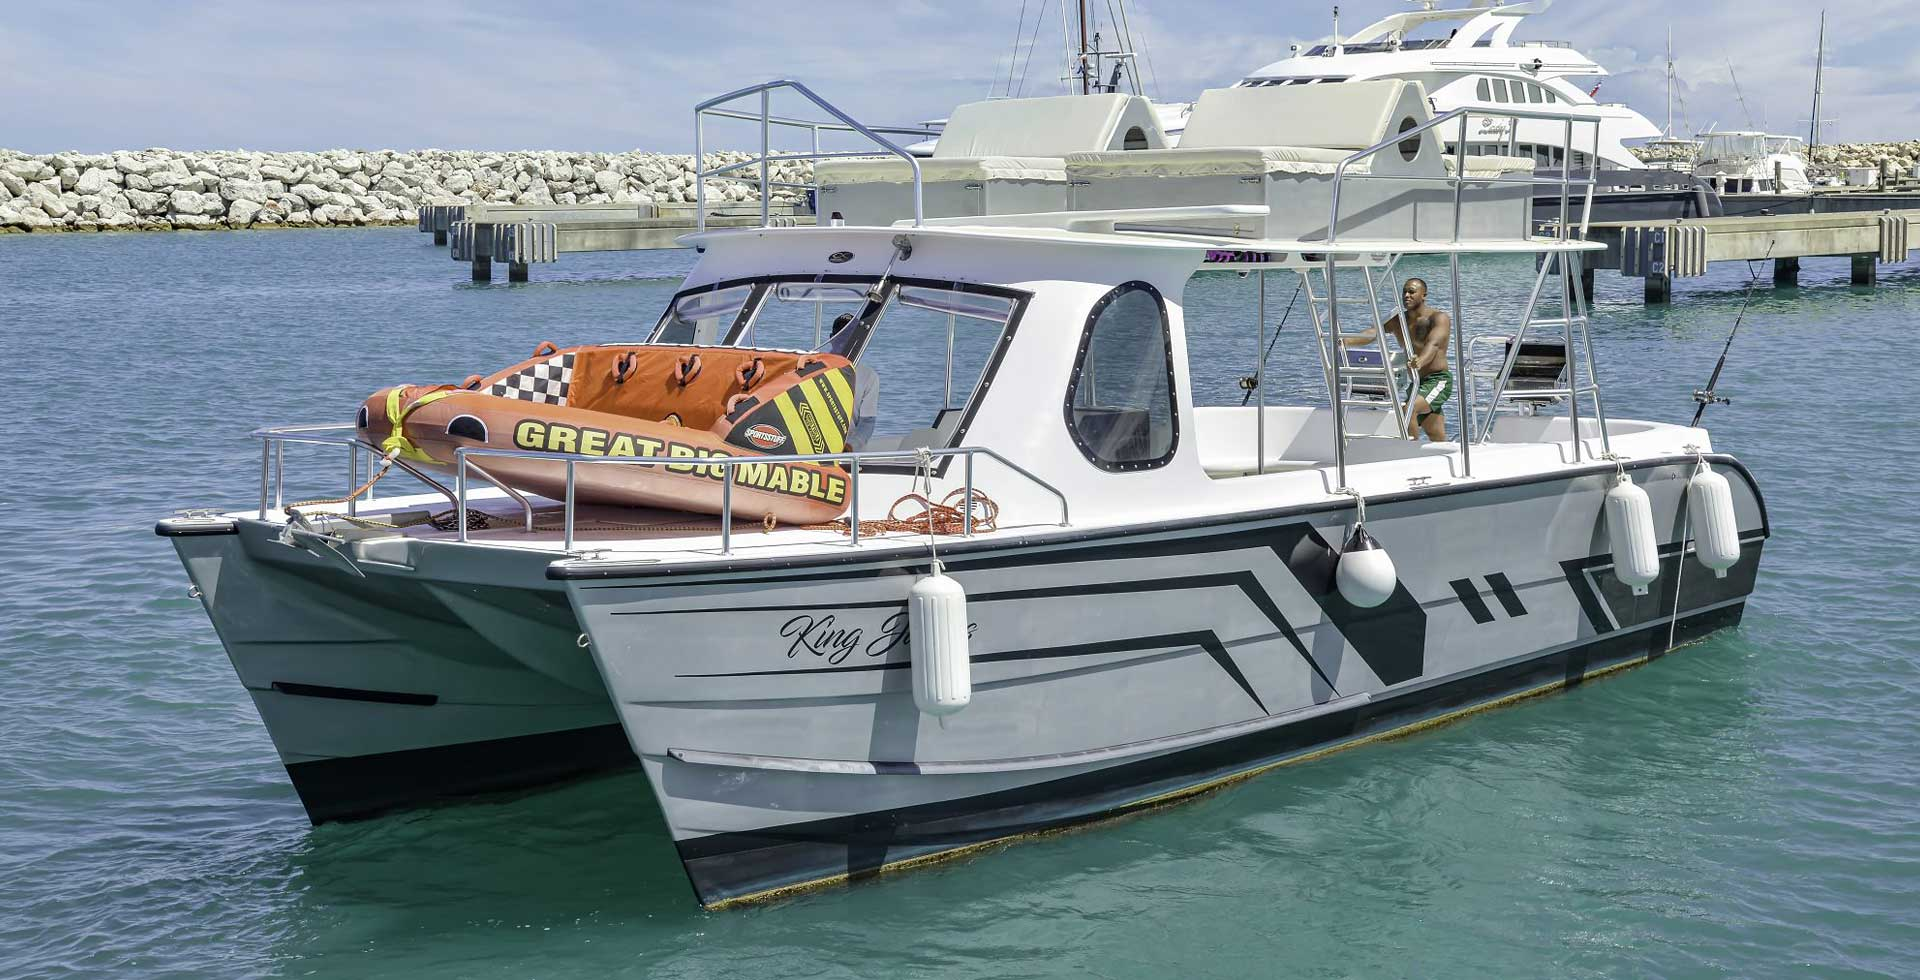 Catamaran for 4 hrs